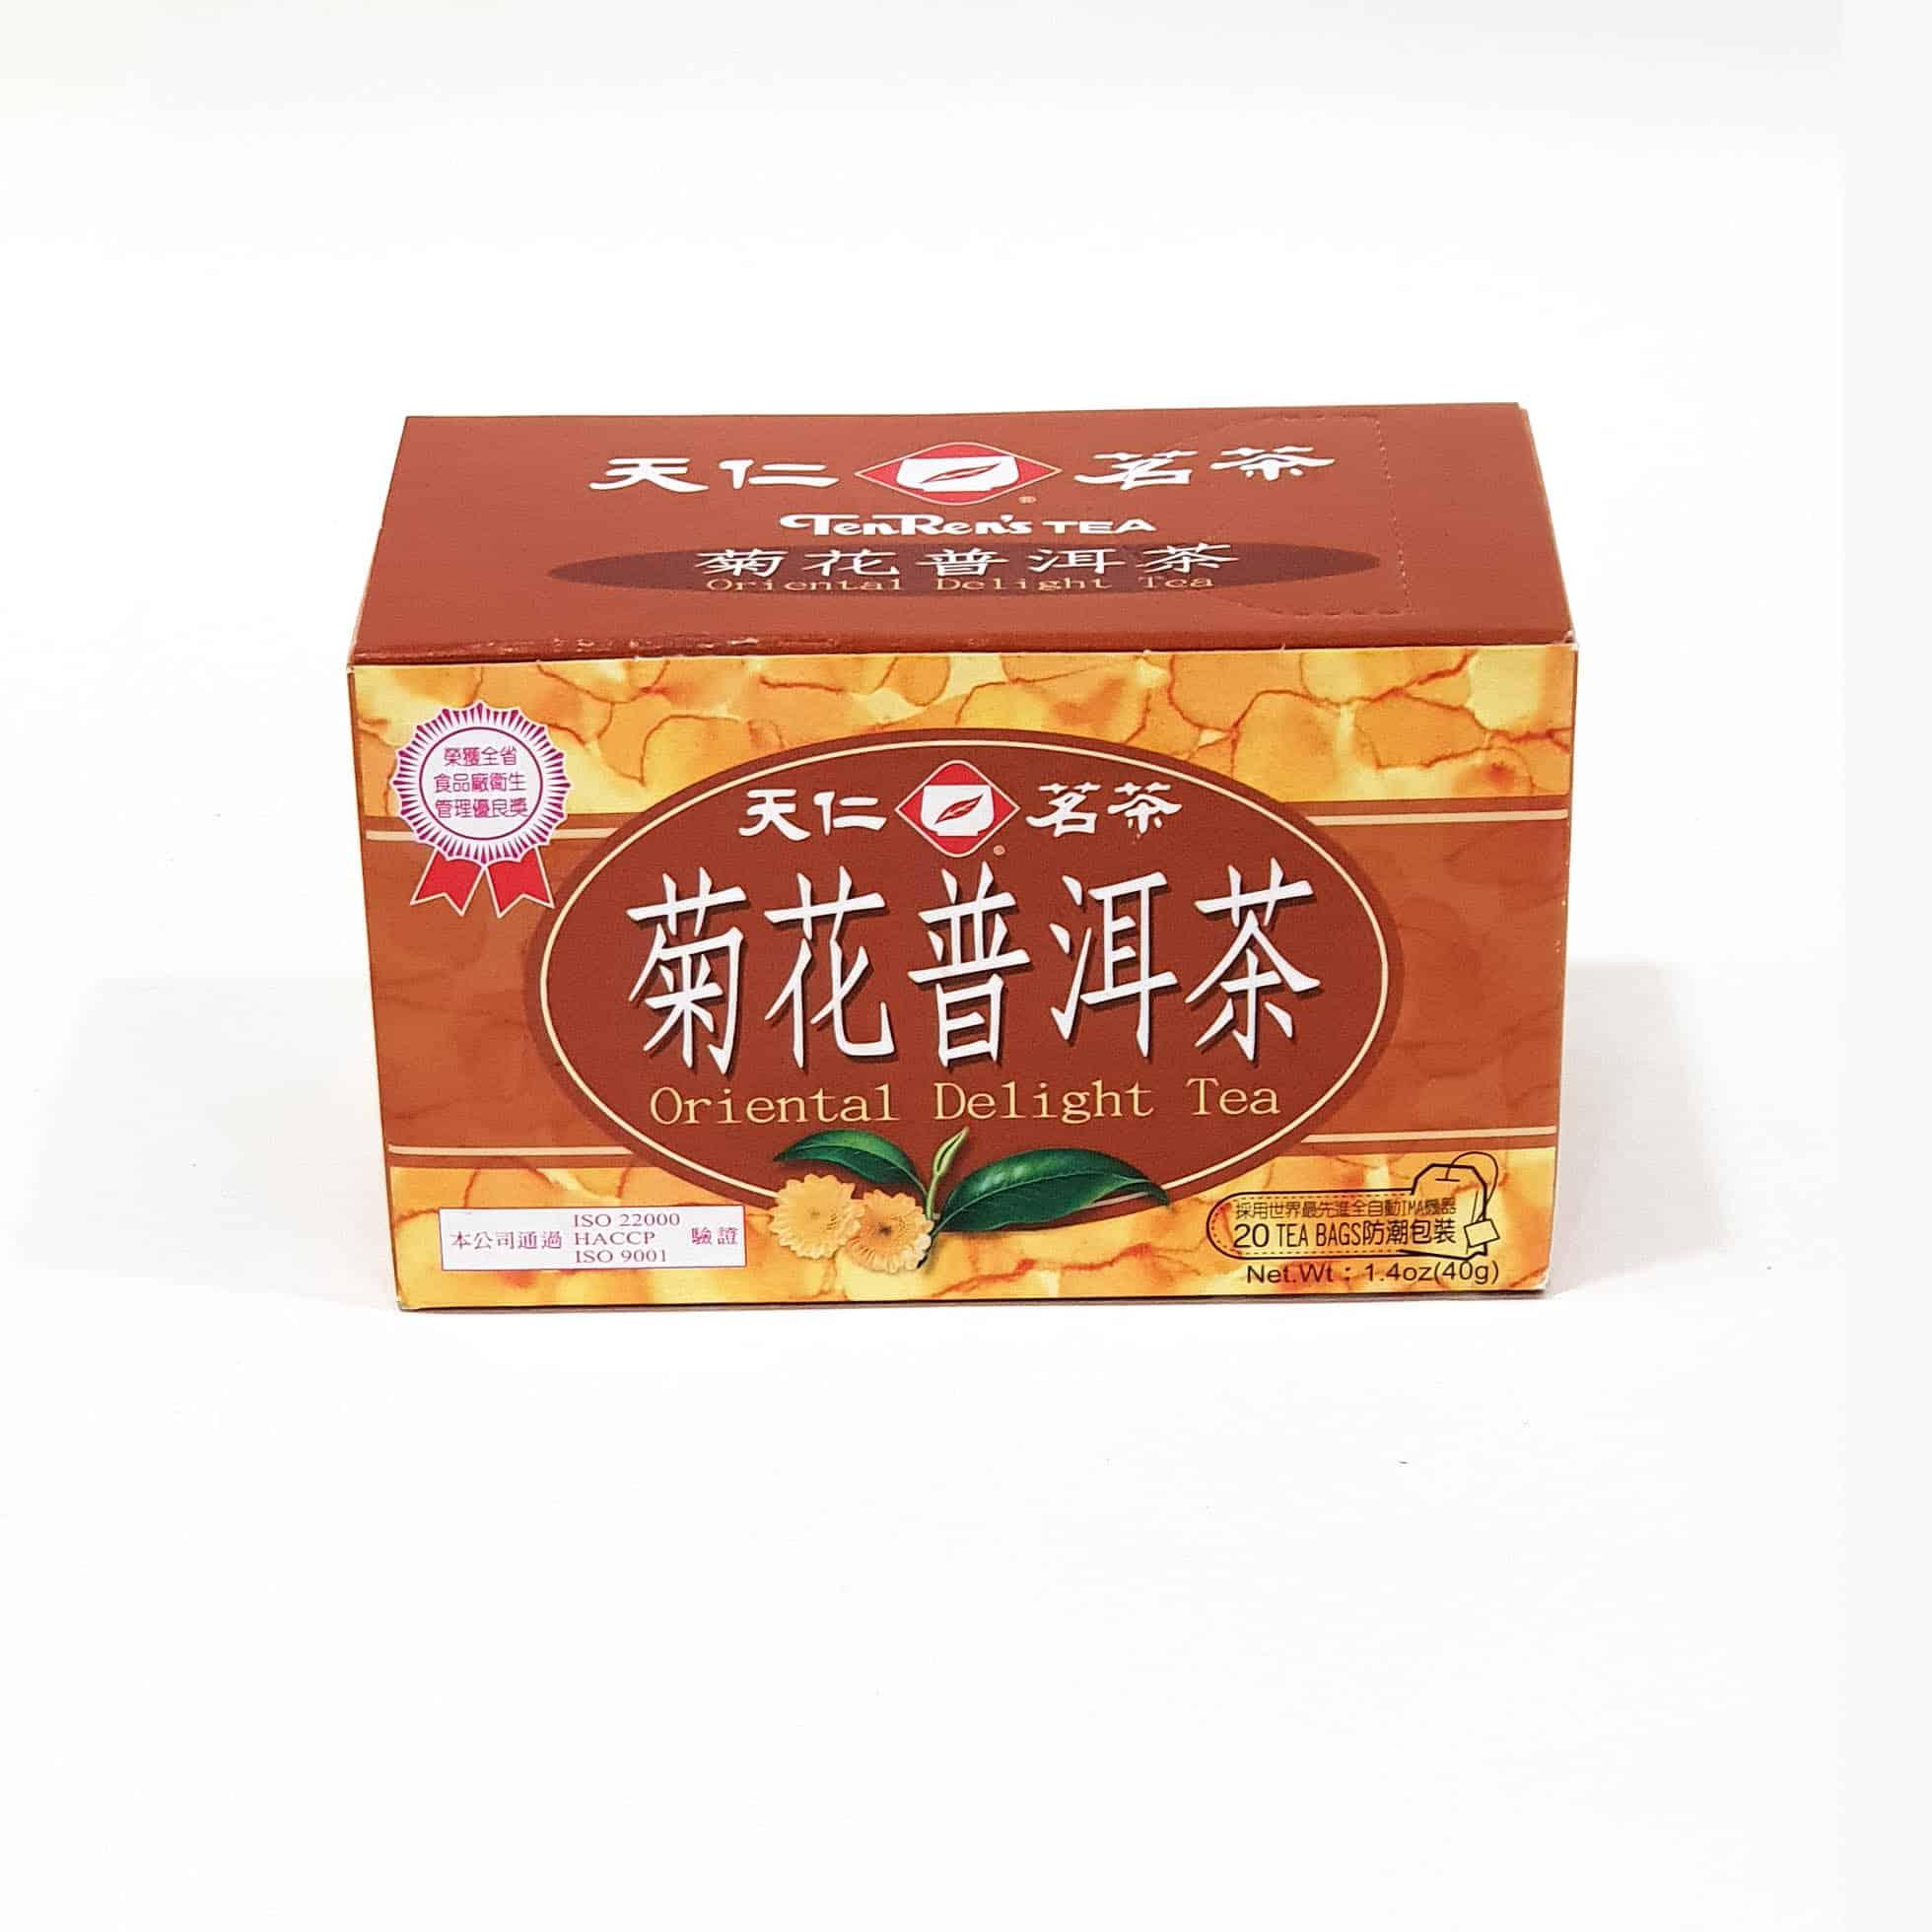 Chrysanthemum Pu Erh Tea Bags (20 pk )